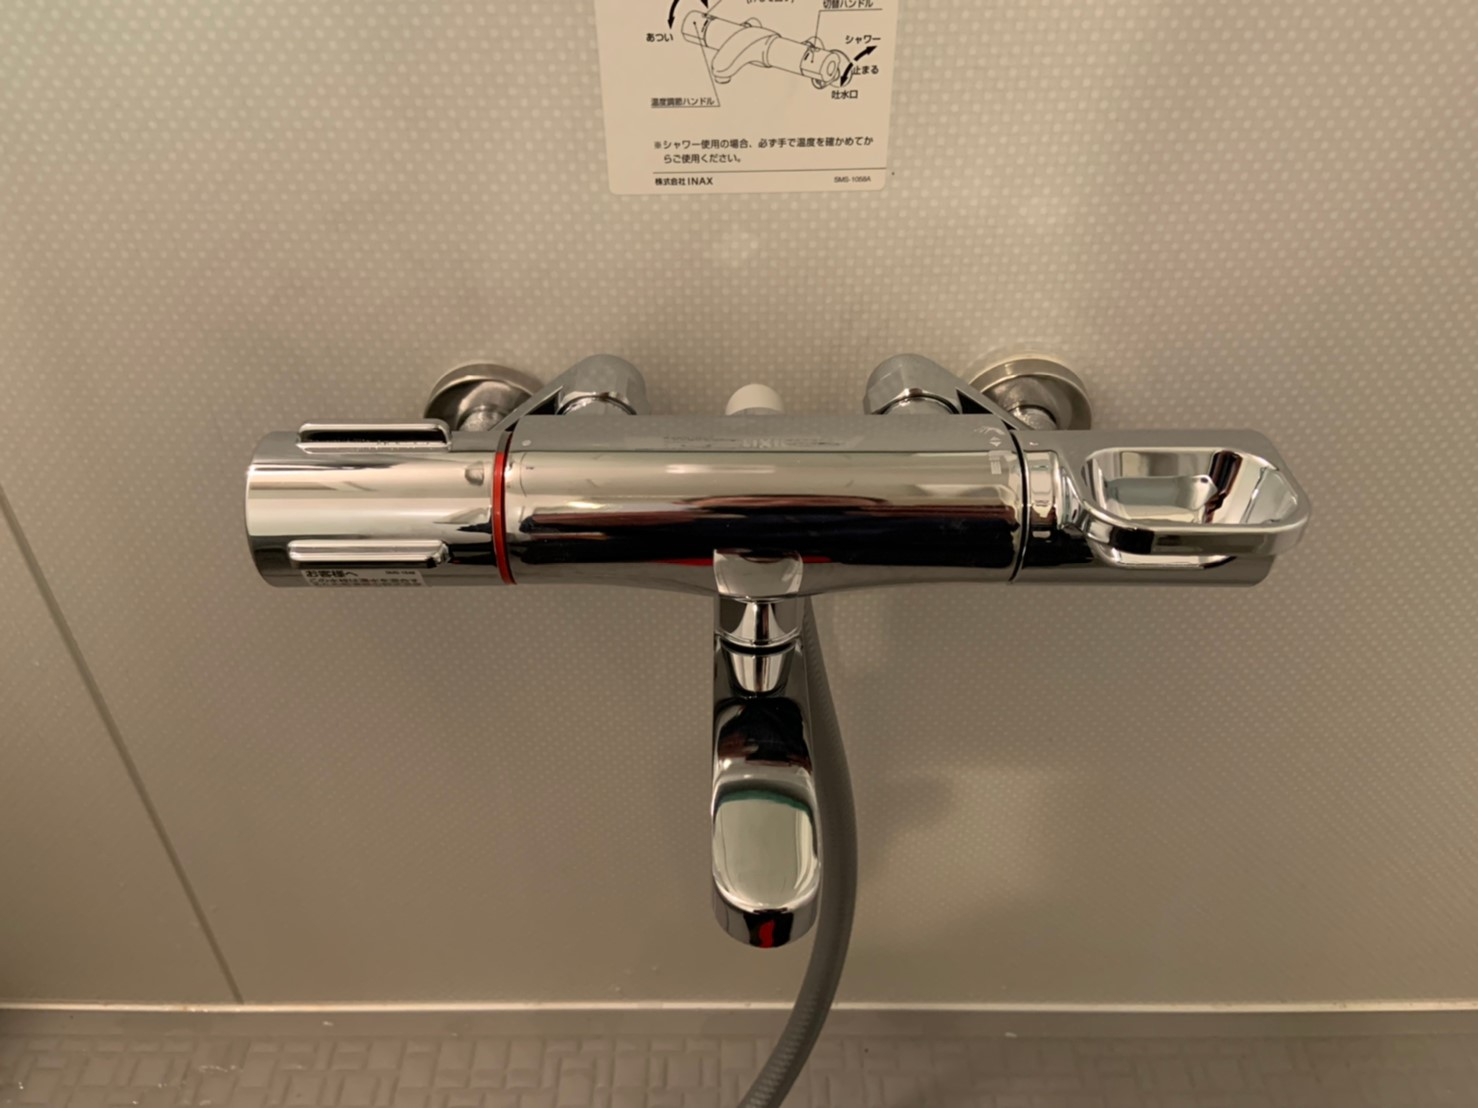 INAXの浴室用カラン交換(BF-WM147TSC)【京都市東山区】